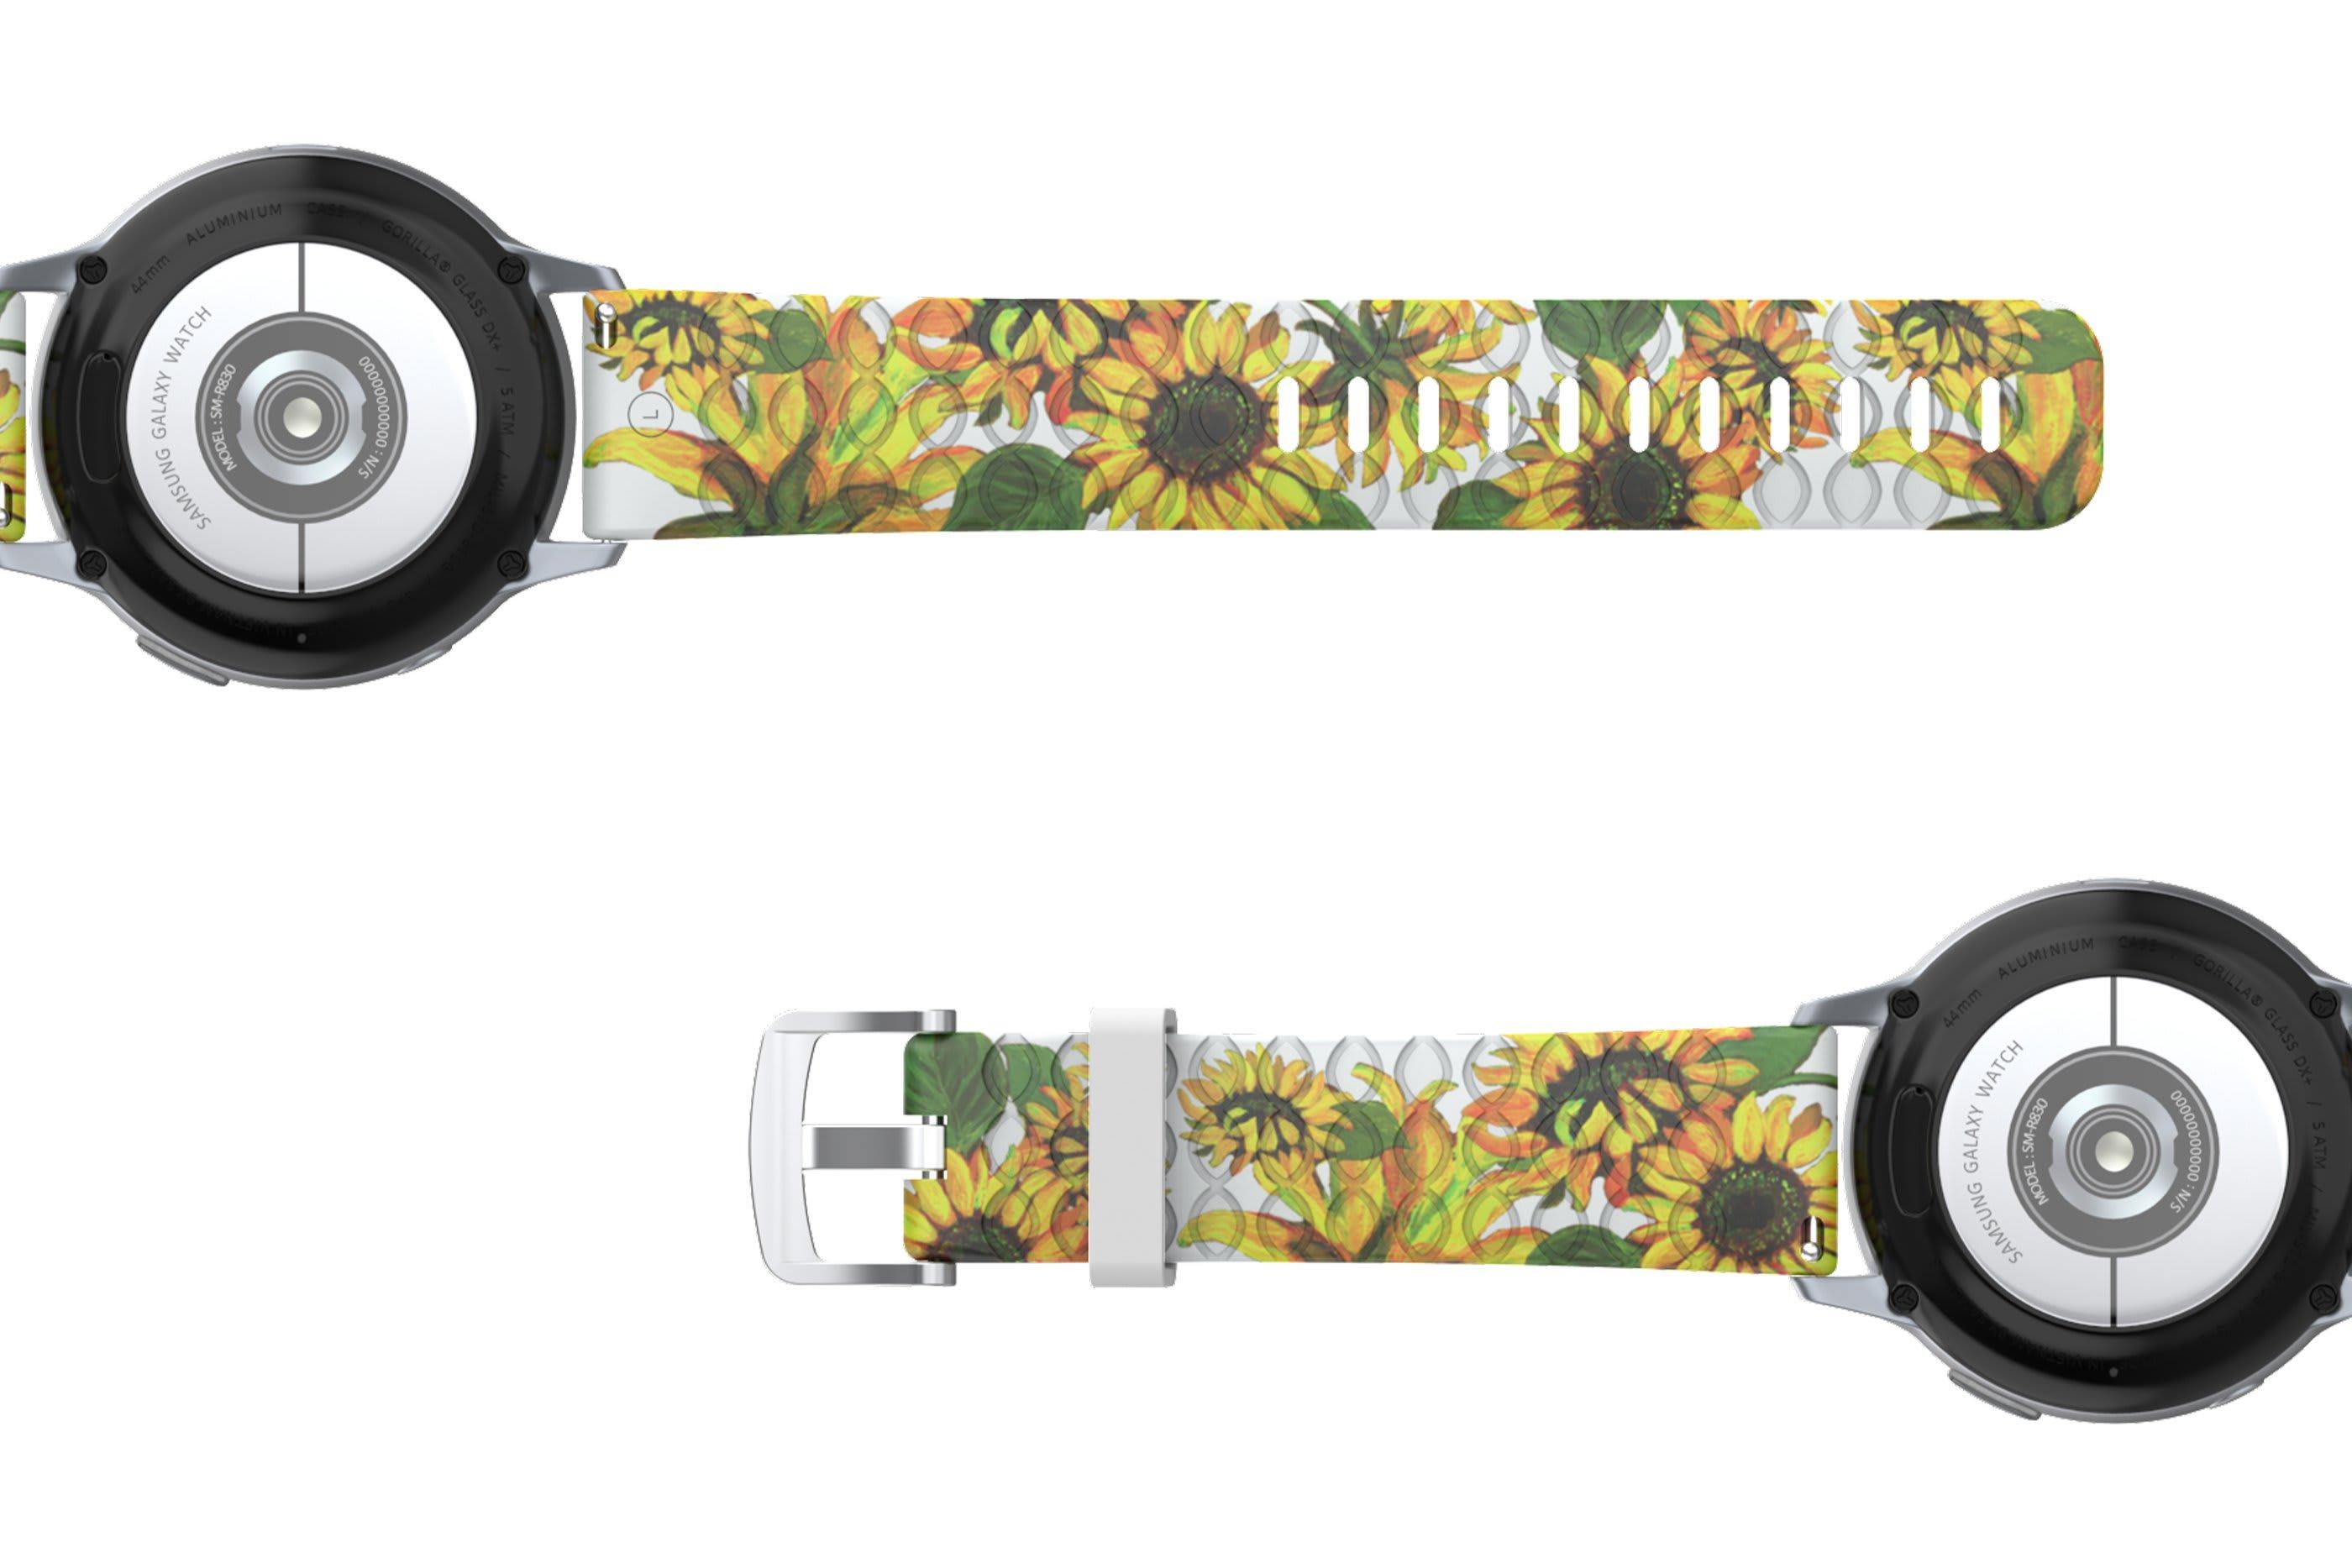 Sunflower Samsung 22mm   watch band viewed bottom up